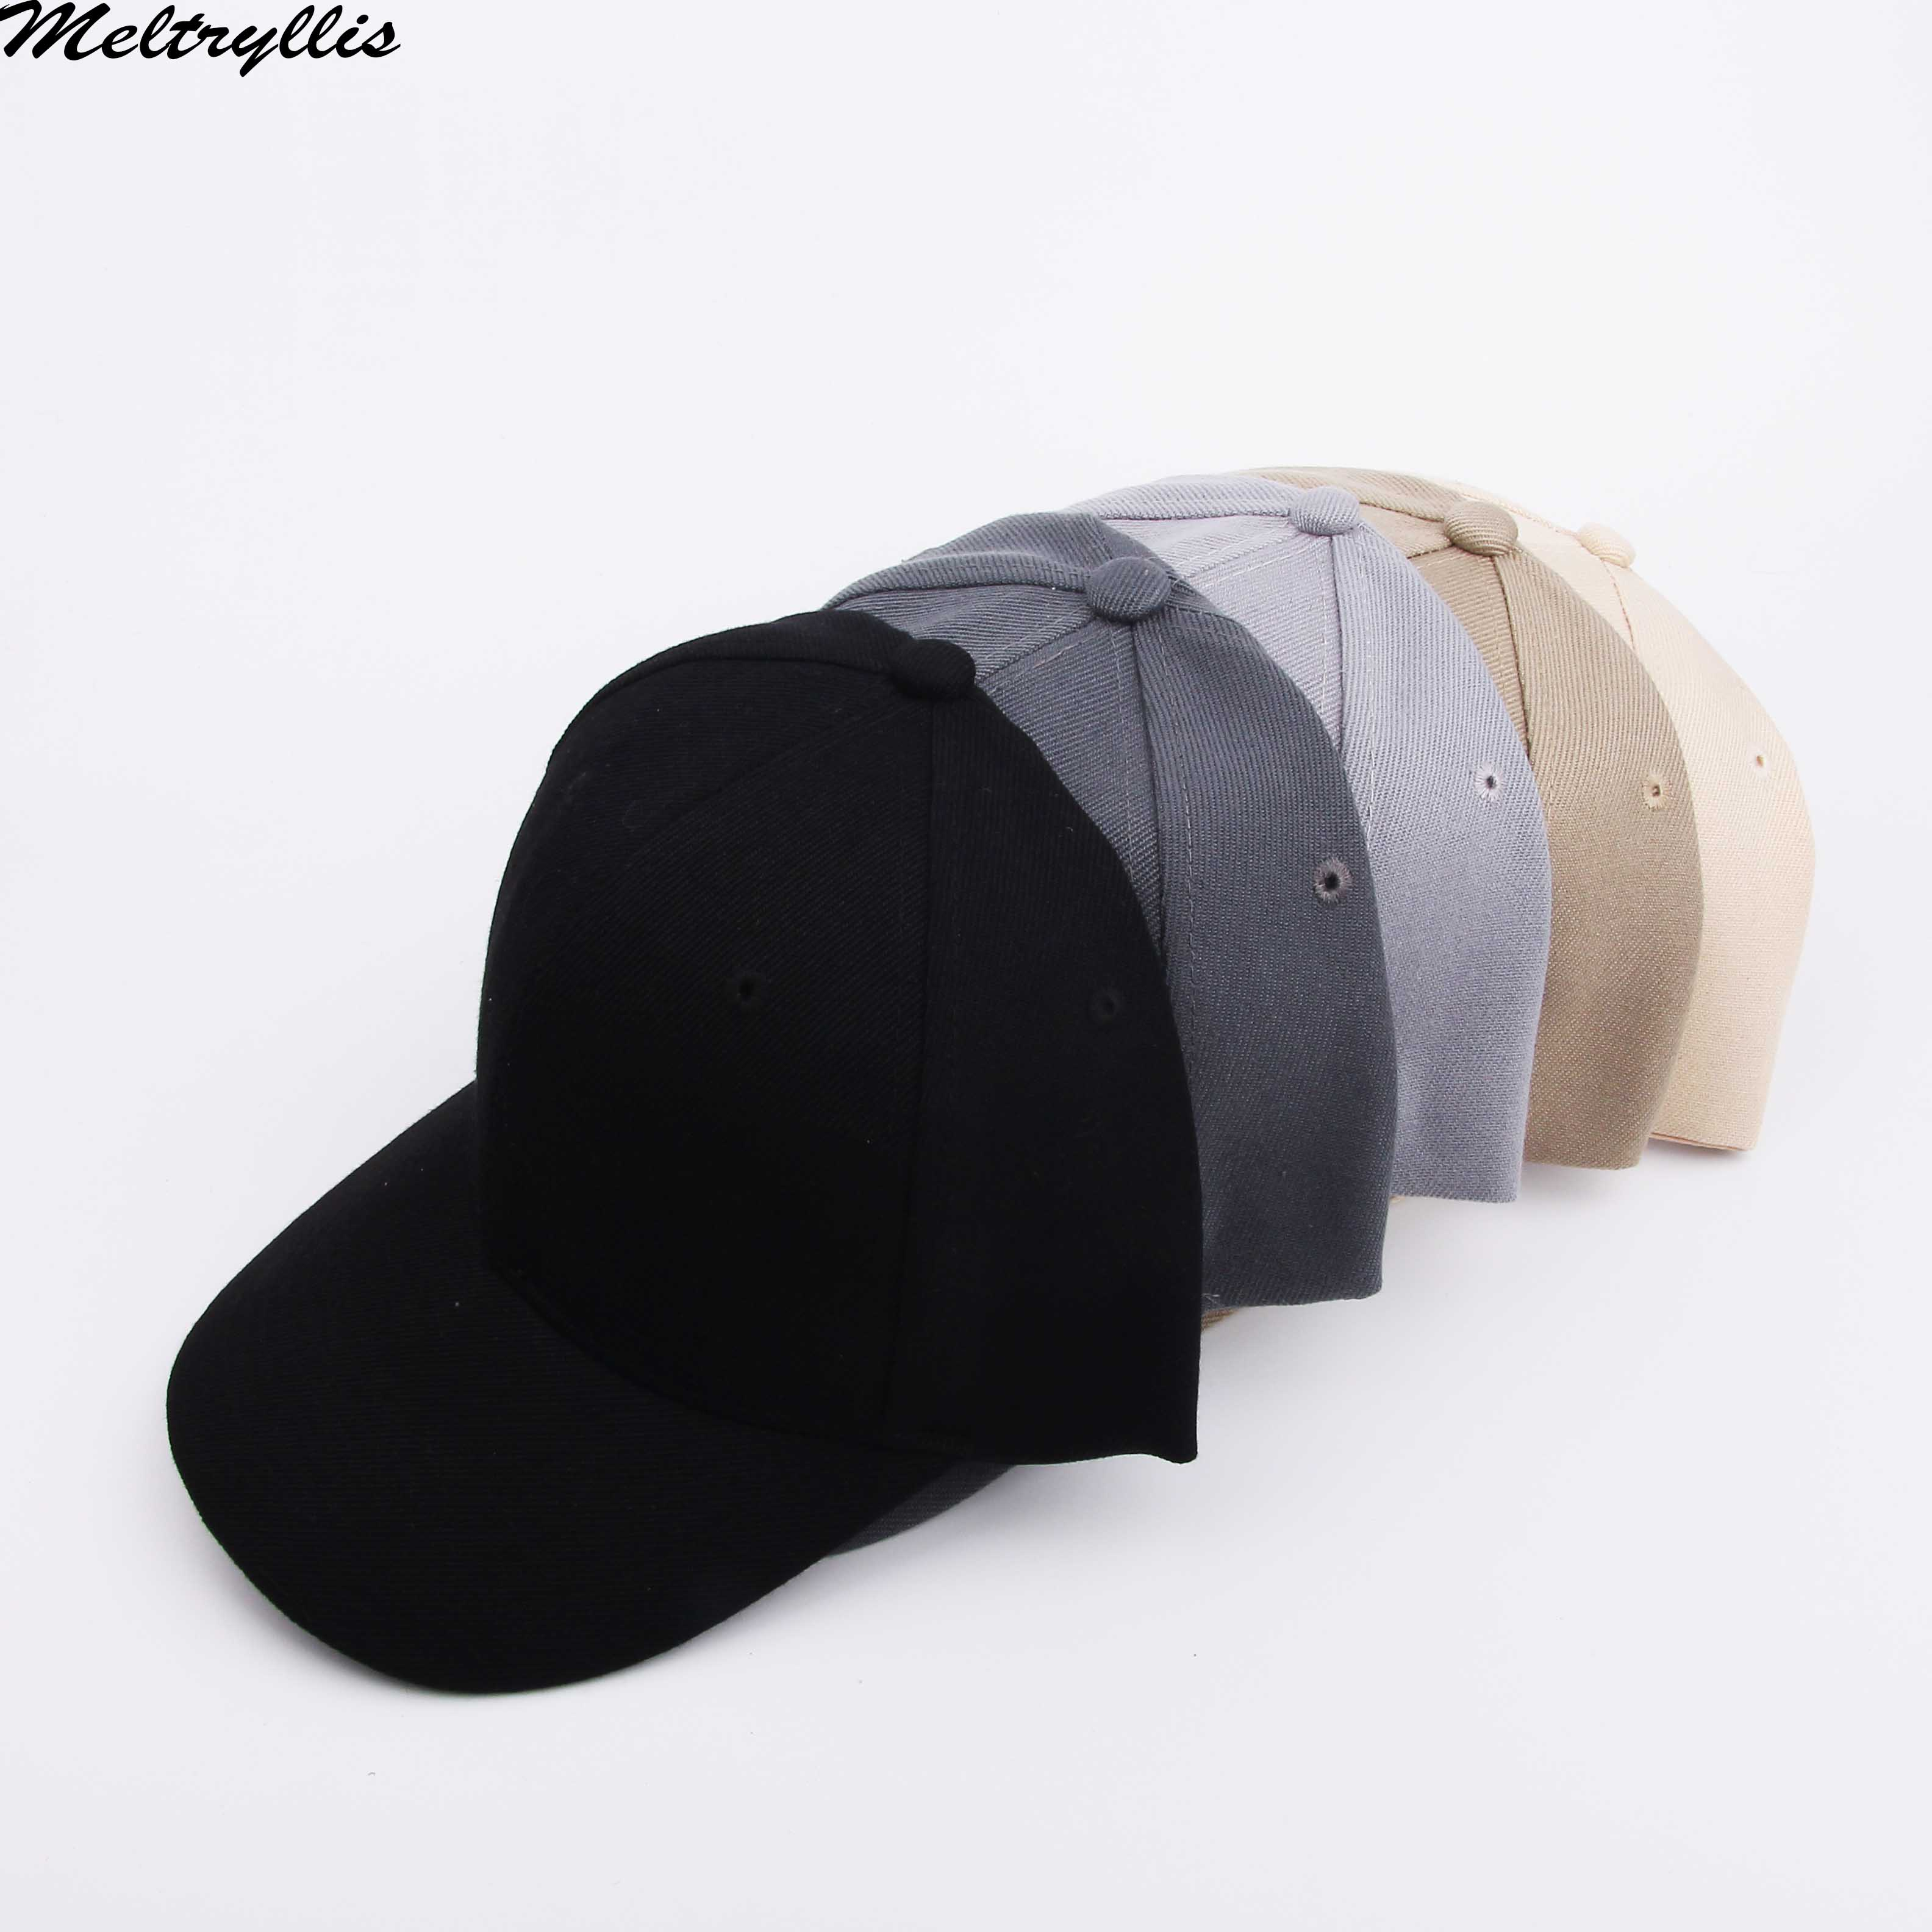 [Meltryllis]High Cotton Adjustable Solid Color Baseball Cap Unisex Couple Caps Fashion Leisure Dad Hat Snapback Hats